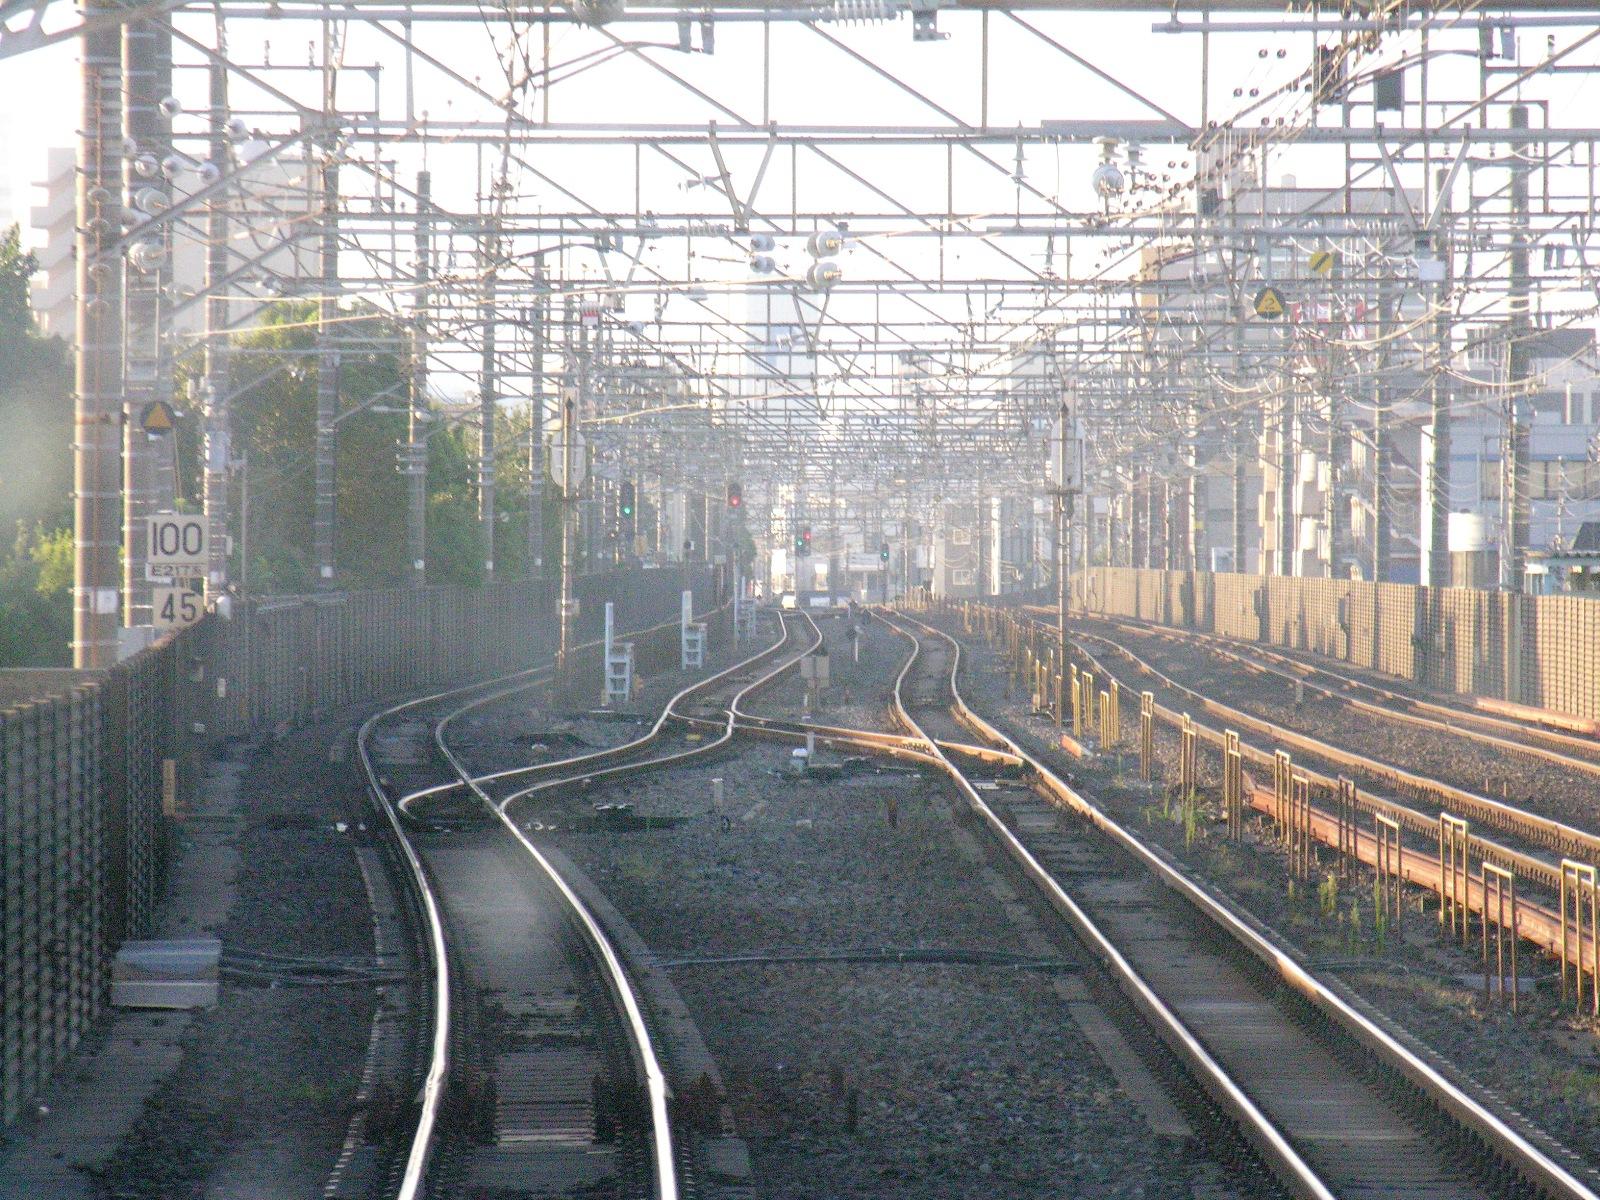 https://upload.wikimedia.org/wikipedia/commons/1/17/Kurosuna_Signal_Station.jpg